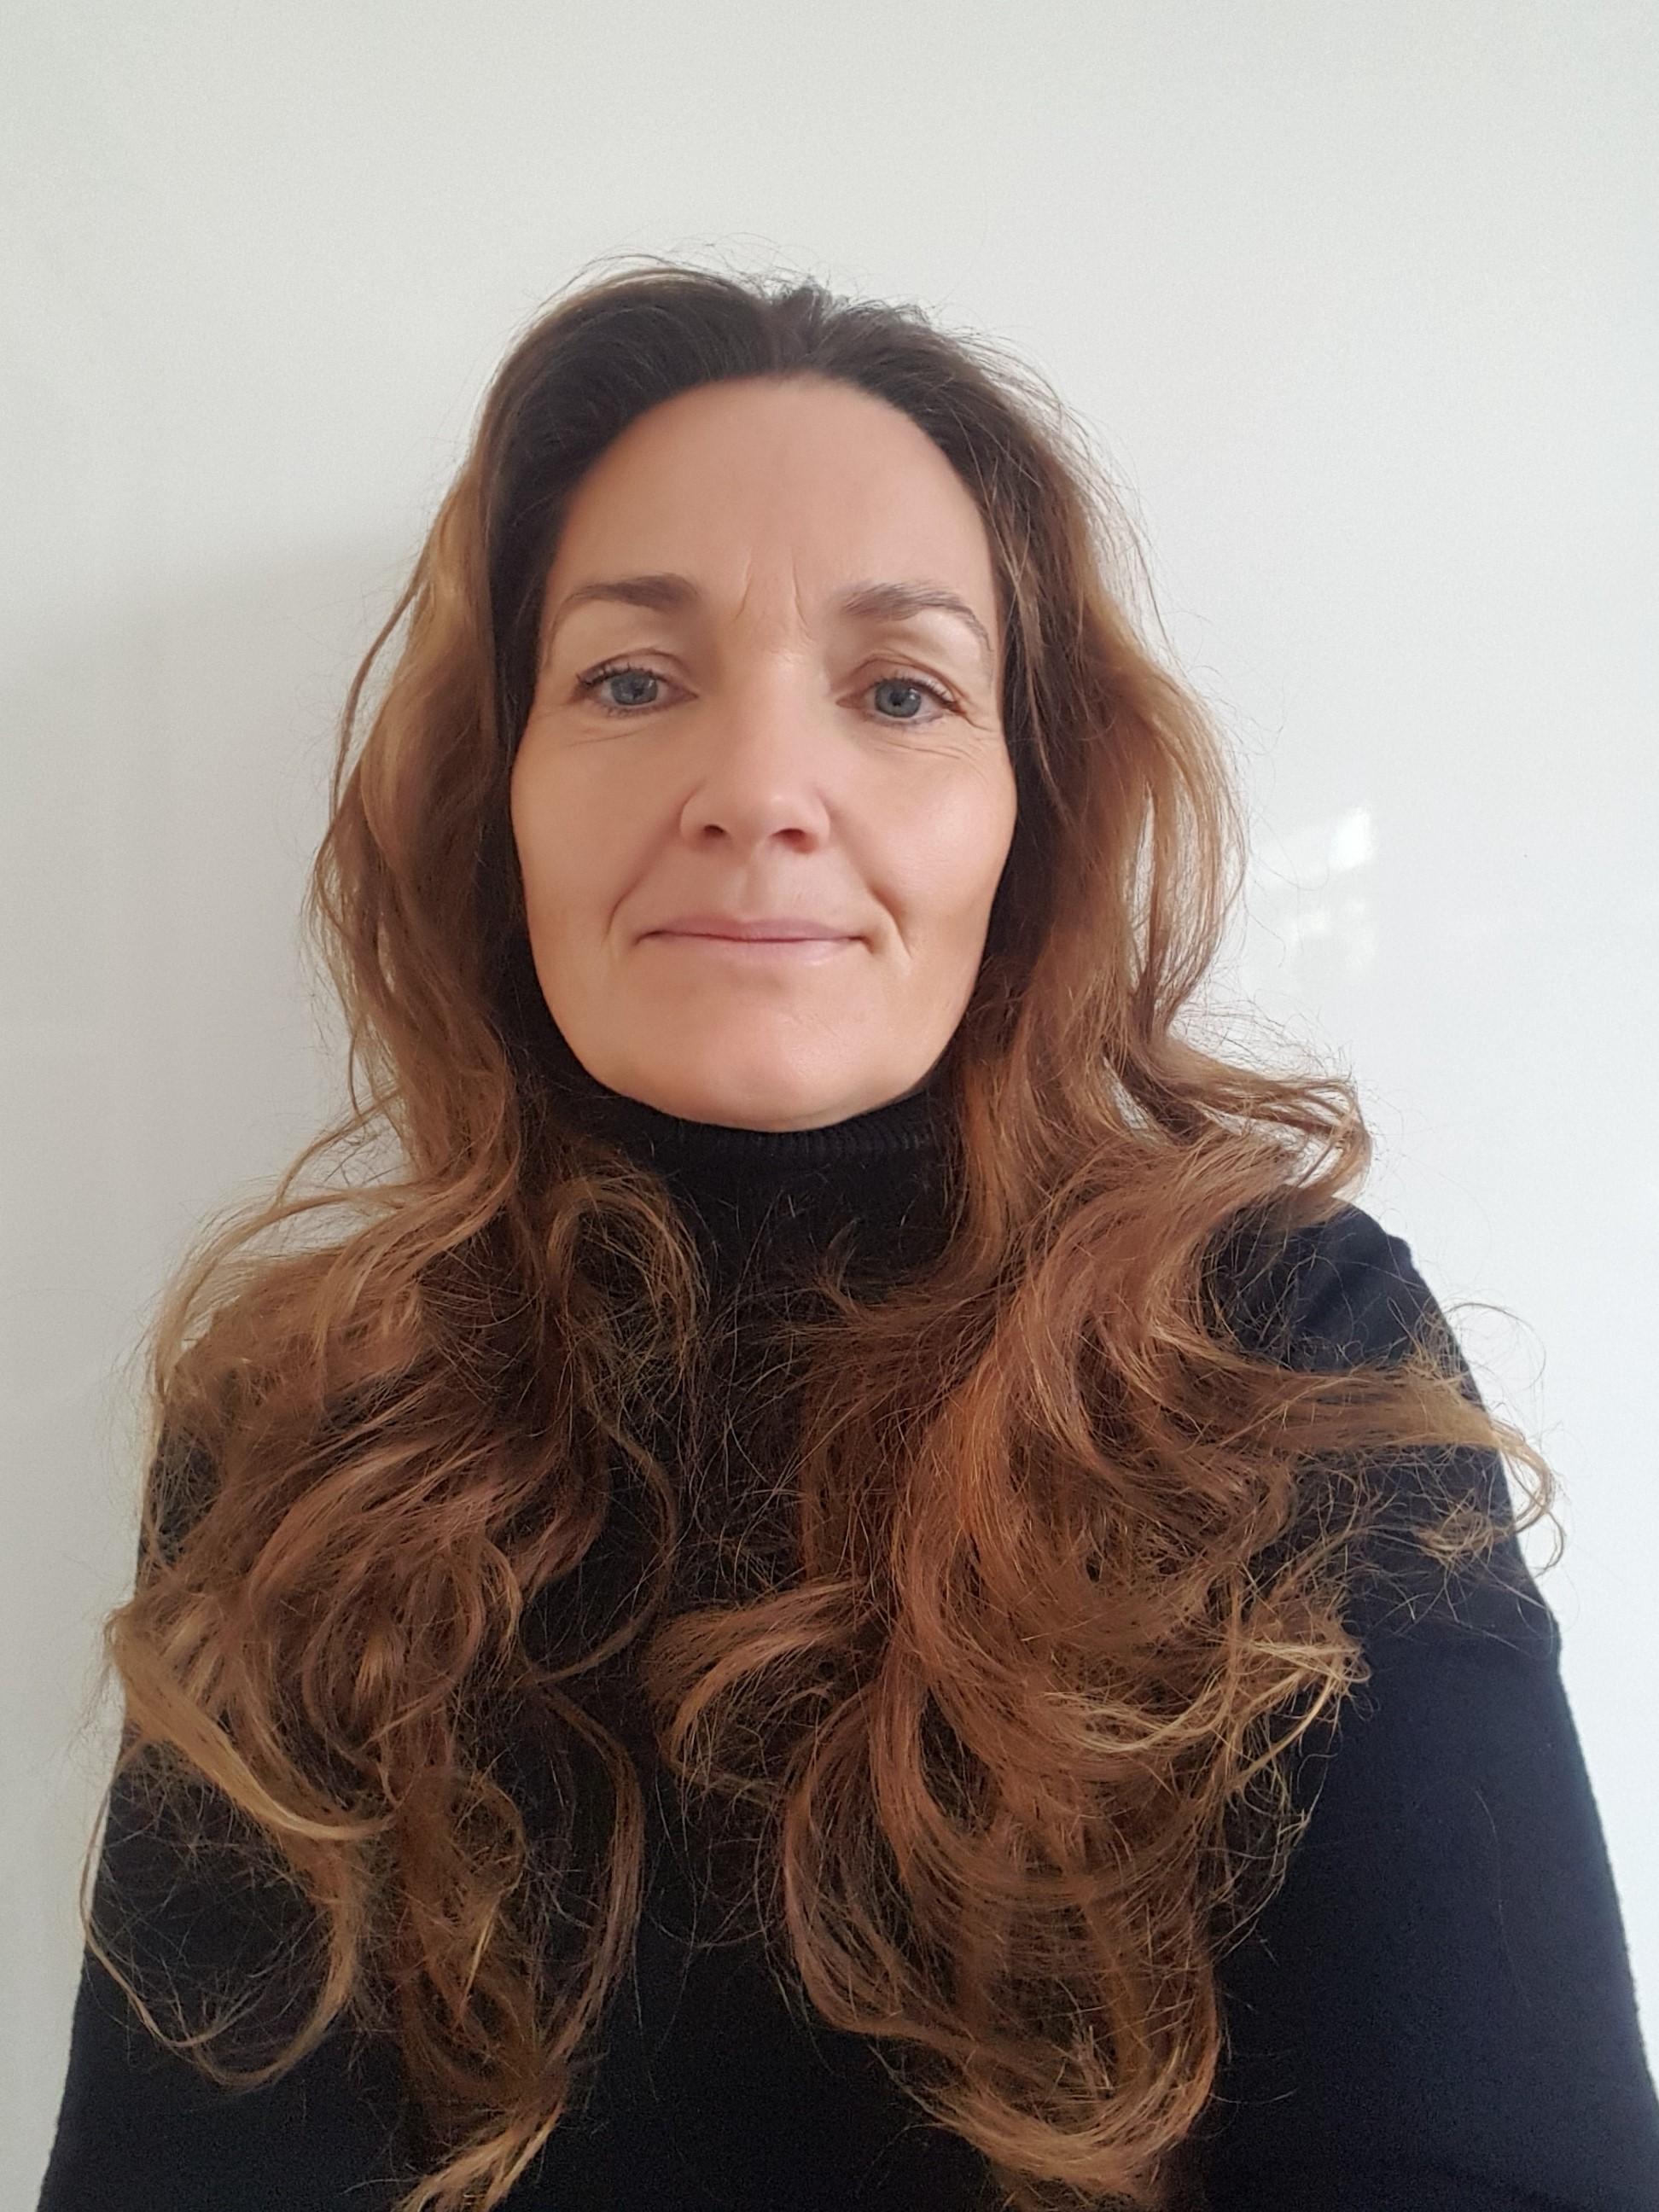 Anne Nygaard Sløk